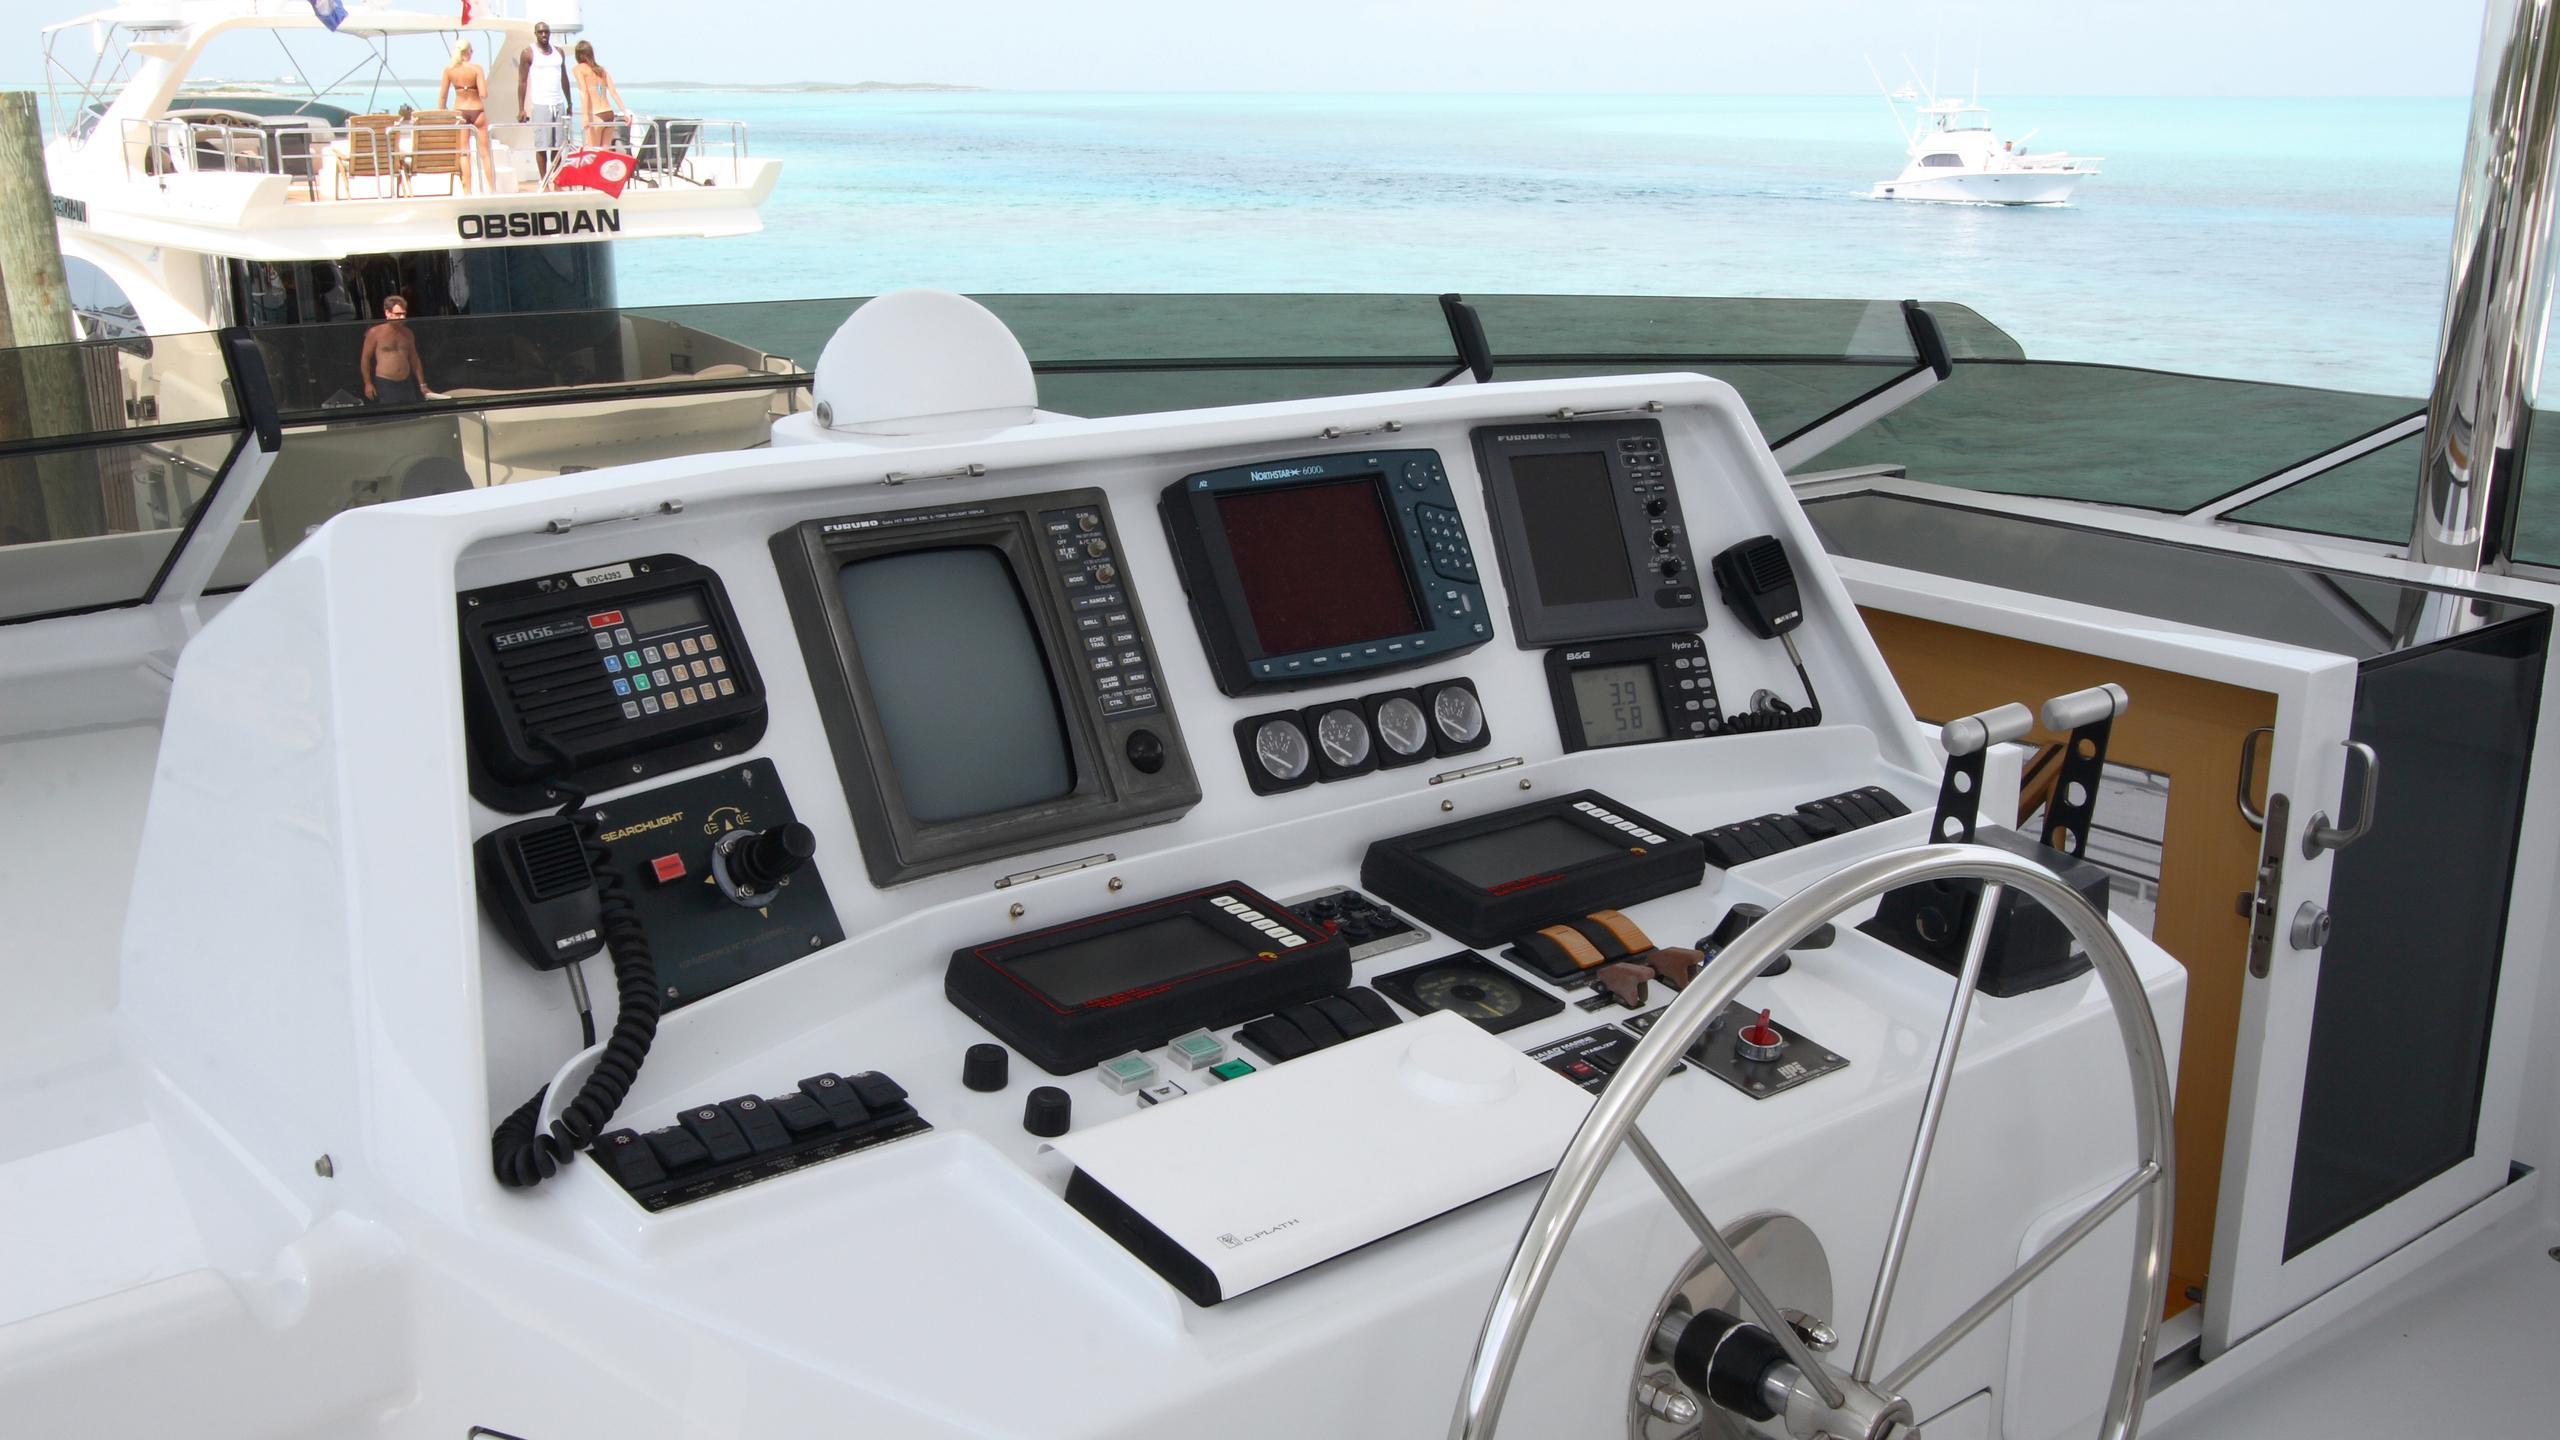 roamin-holiday-yacht-helm-deck